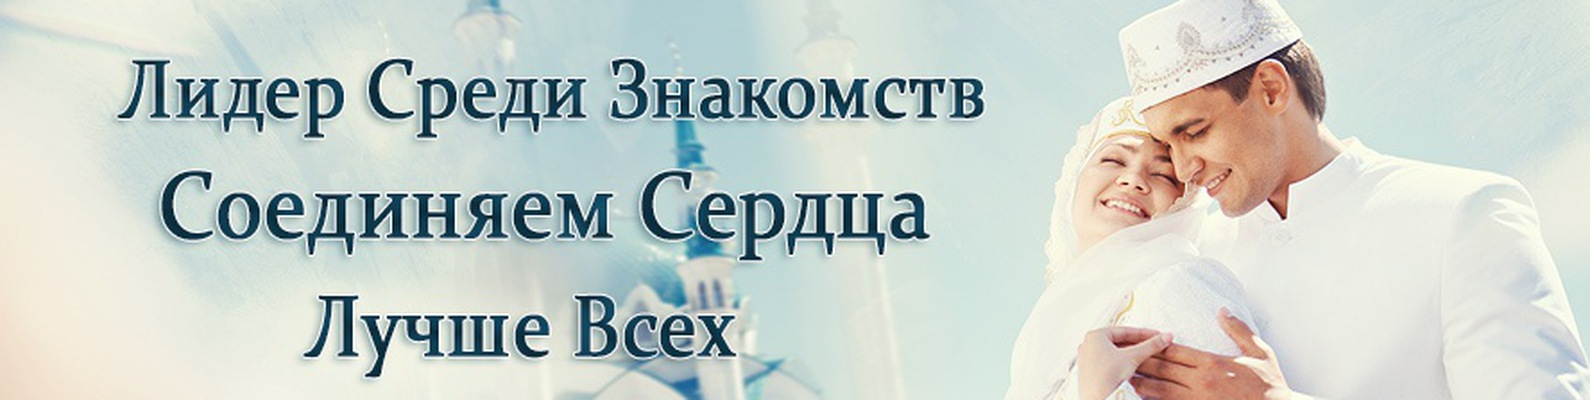 знакомство для татаров